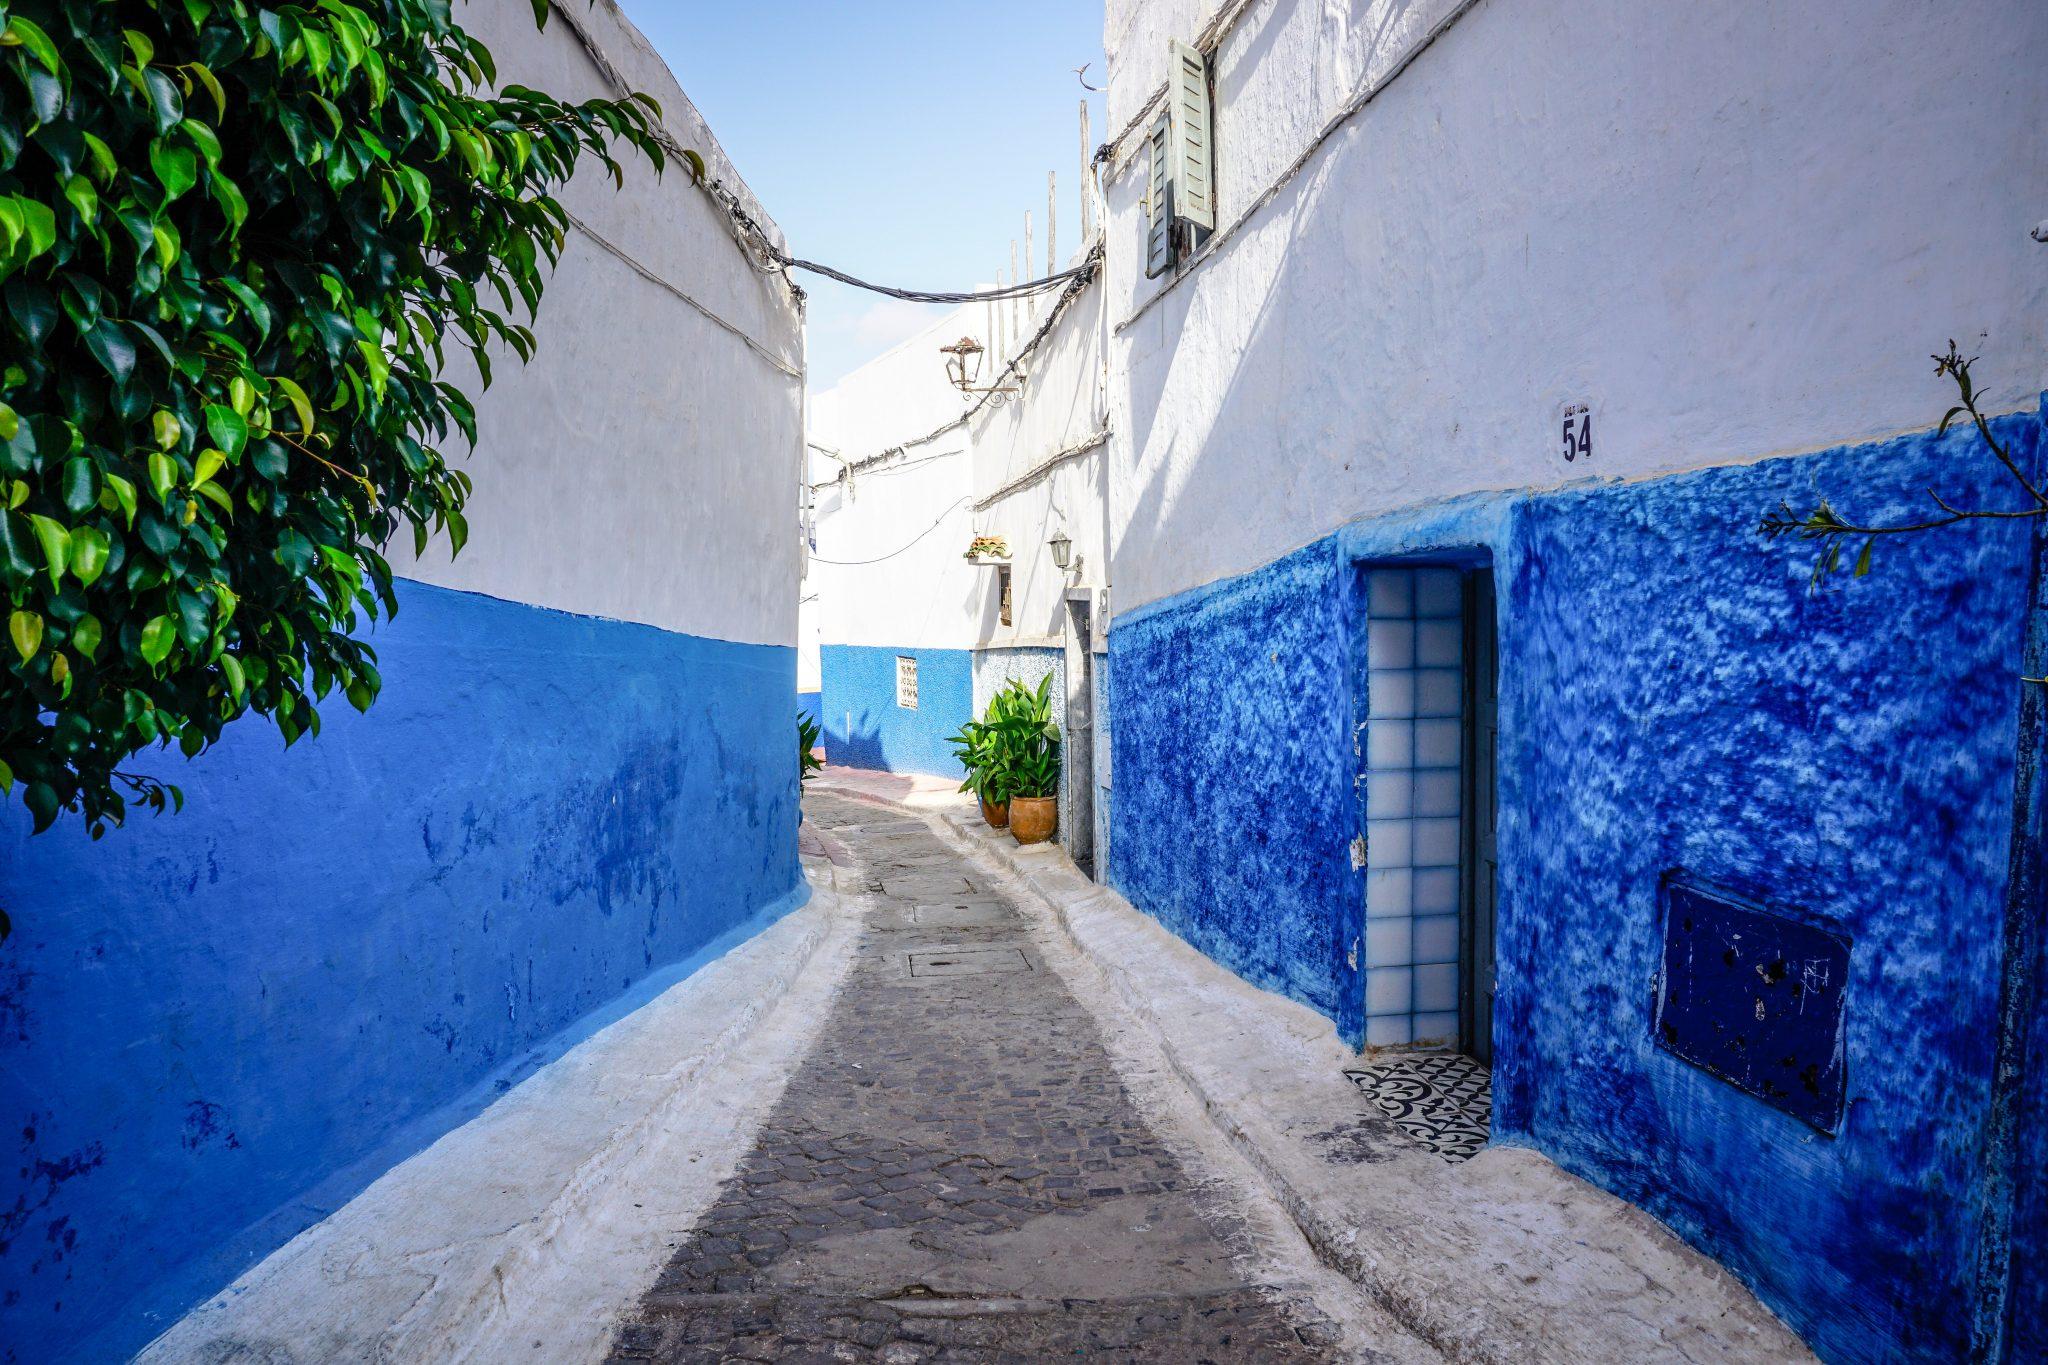 Morocco, Chefchouen, Street